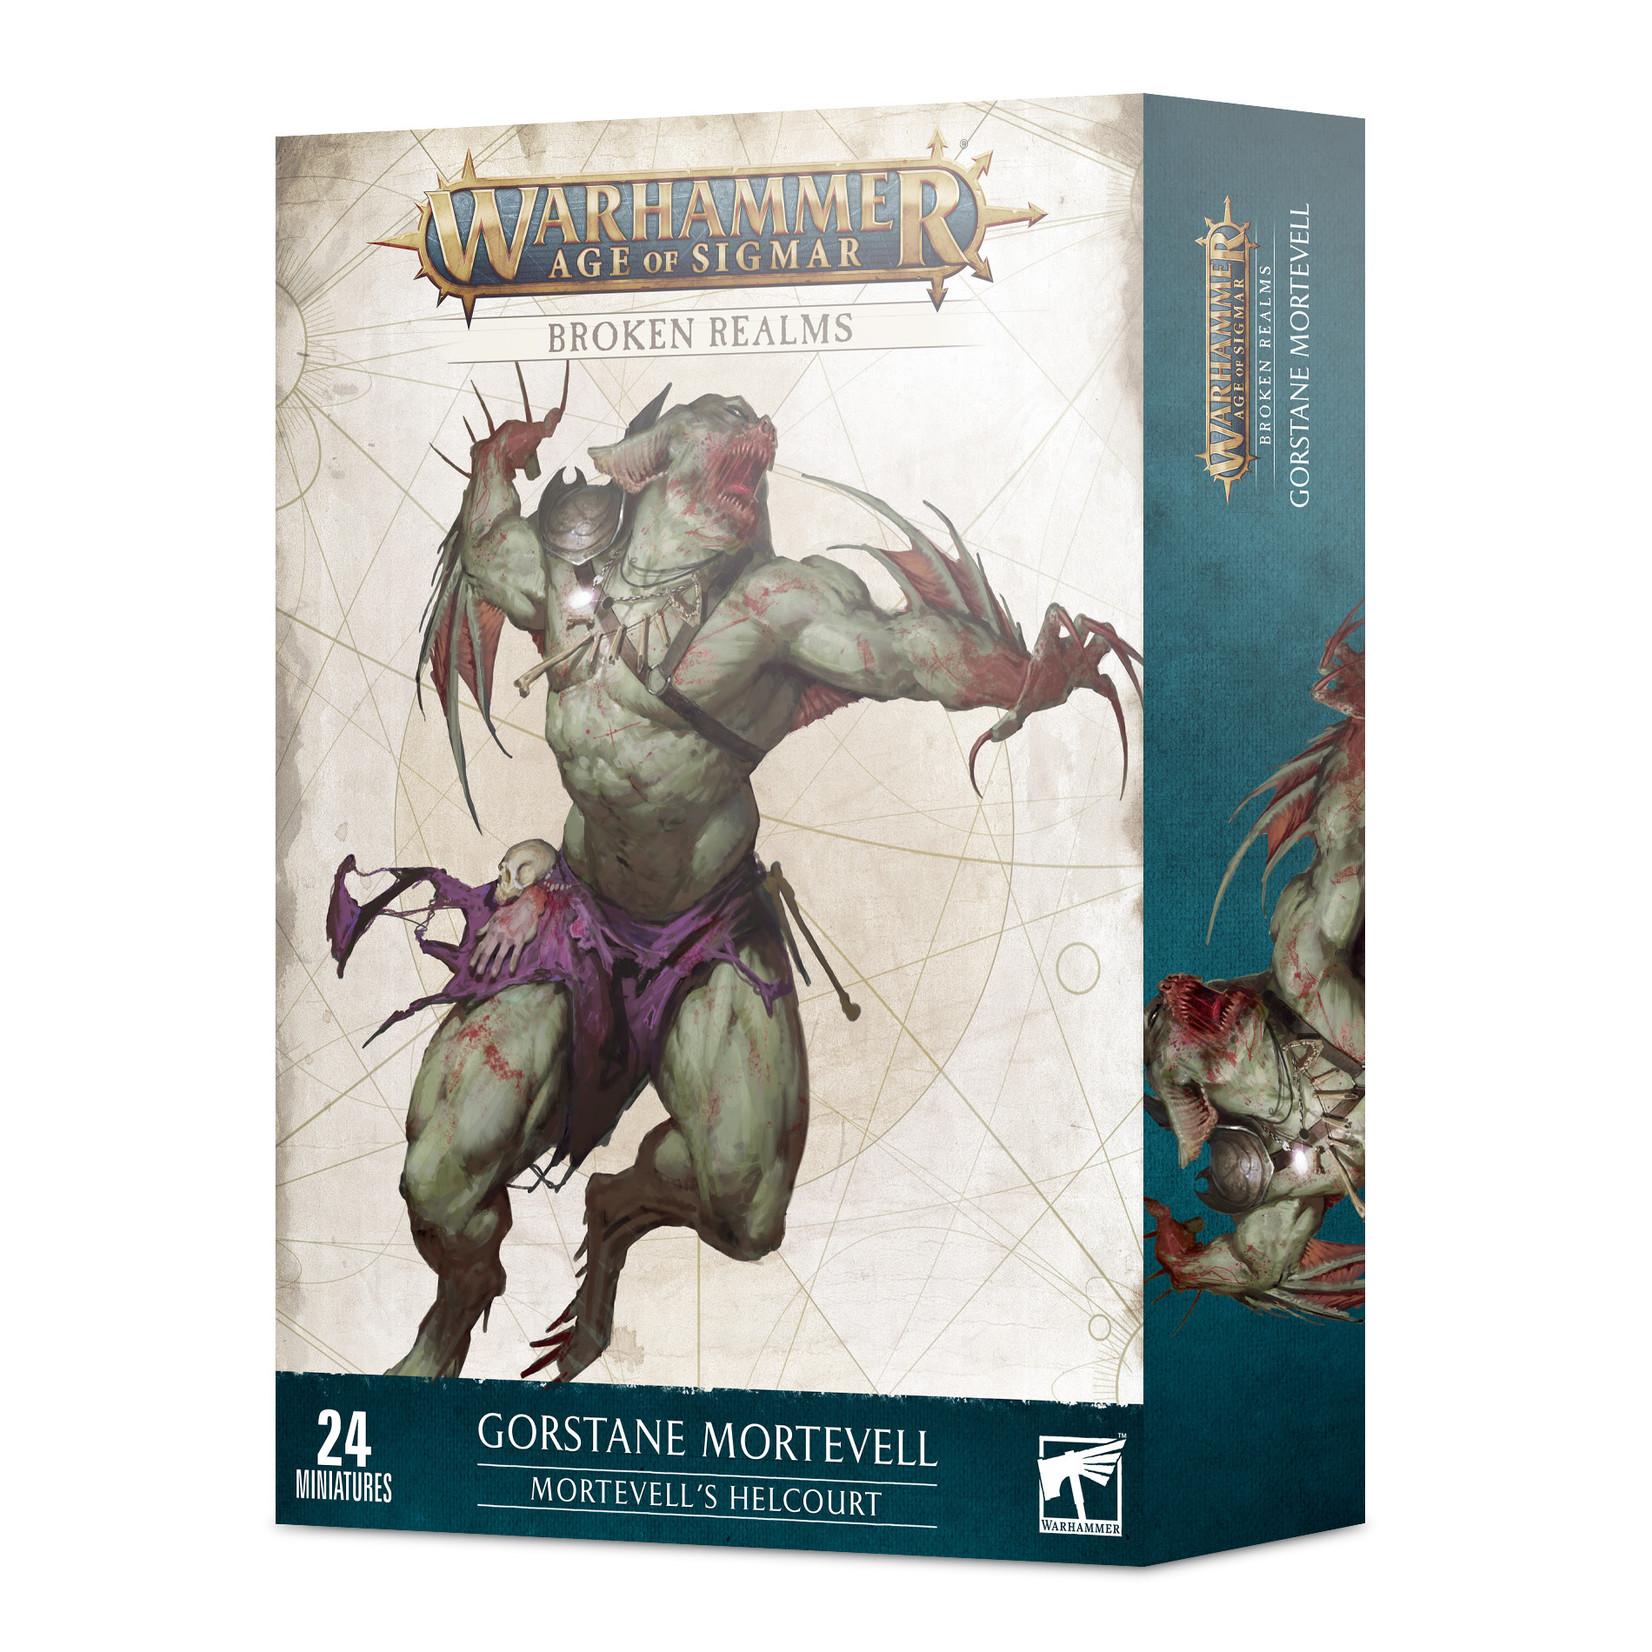 Games Workshop Warhammer Age of Sigmar: Broken Realms - Mortevell's Helcourt